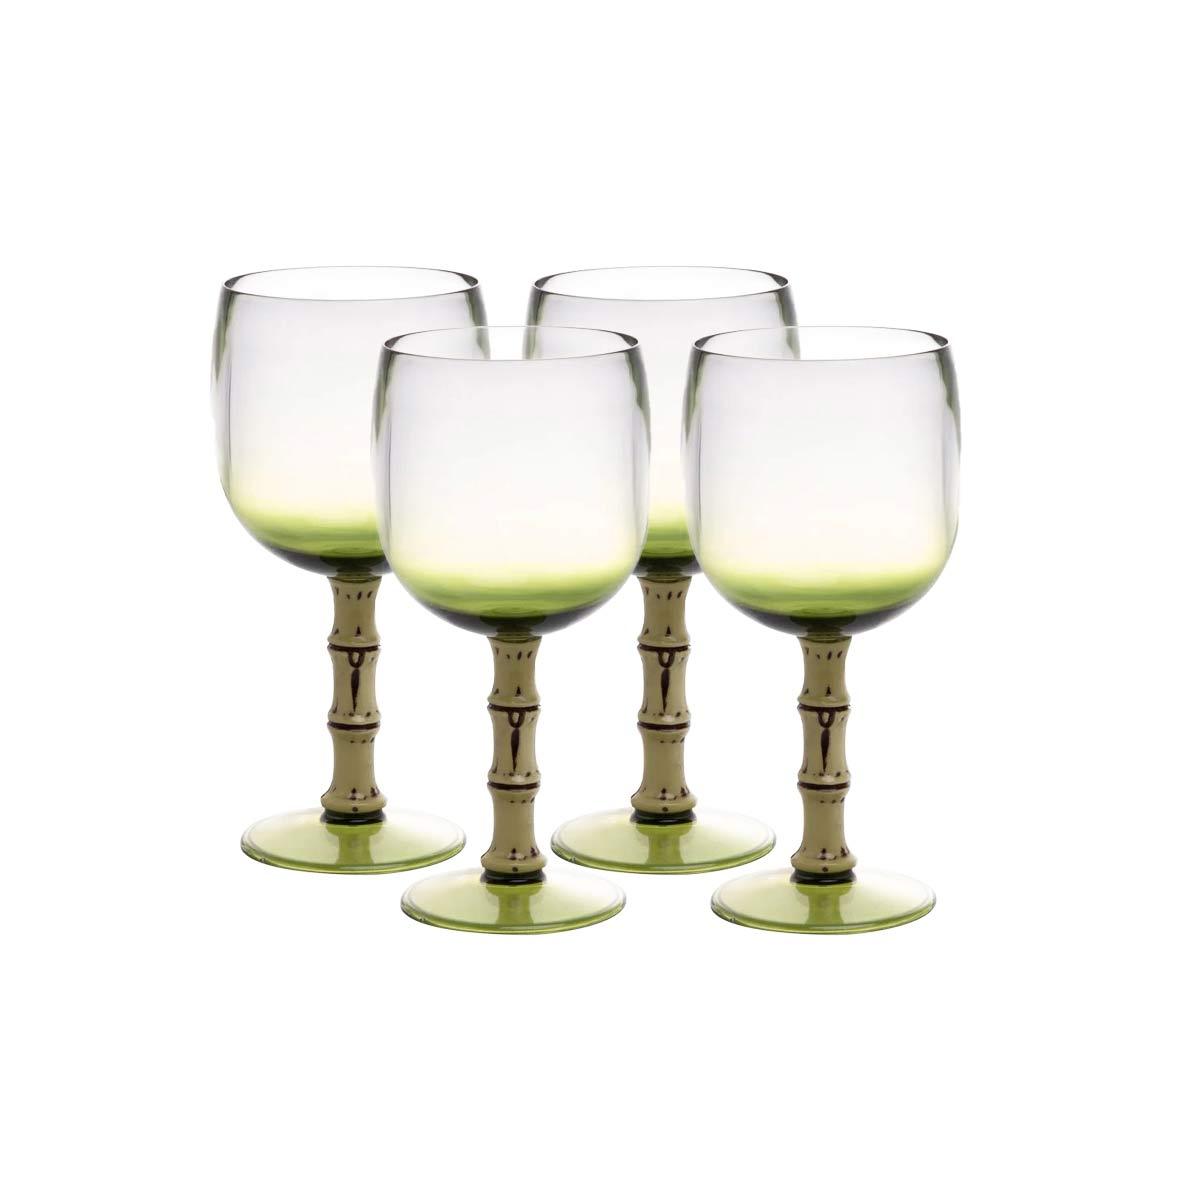 Jogo 4 Taças Acrílico Verde Bon Gourmet 500 ml  - Lemis